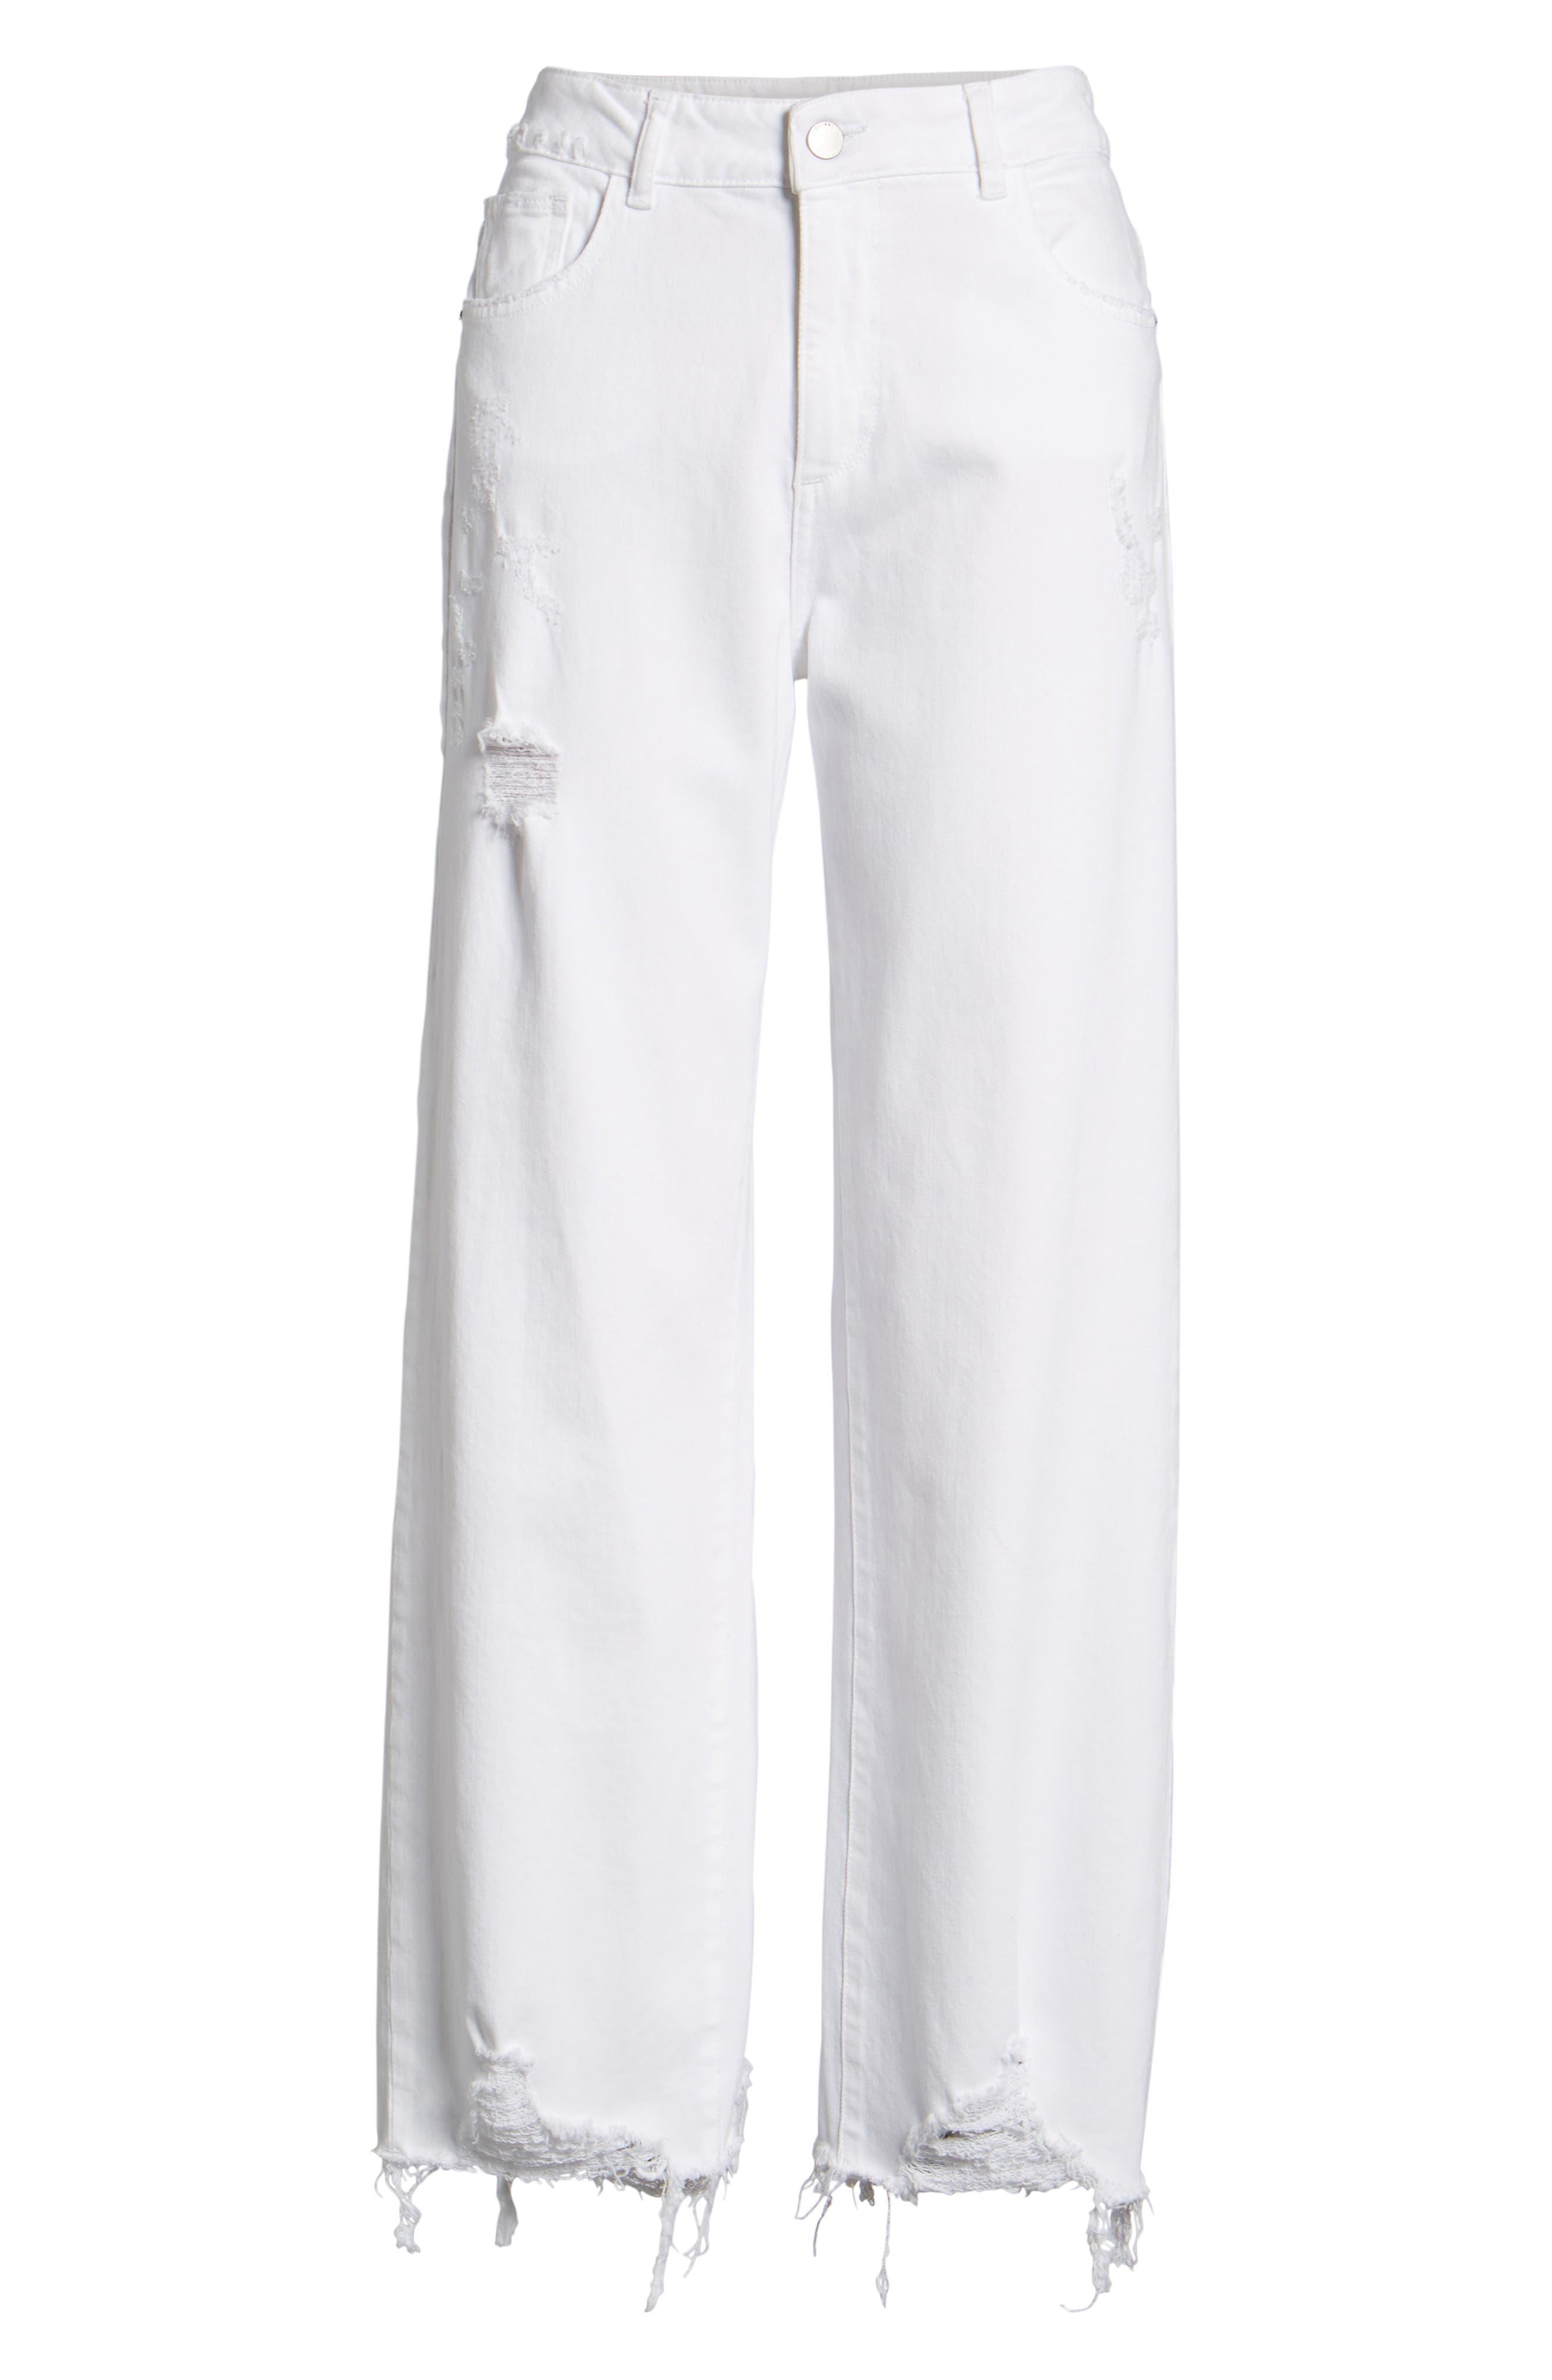 Hepburn High Waist Wide Leg Jeans,                             Alternate thumbnail 7, color,                             Sacramento